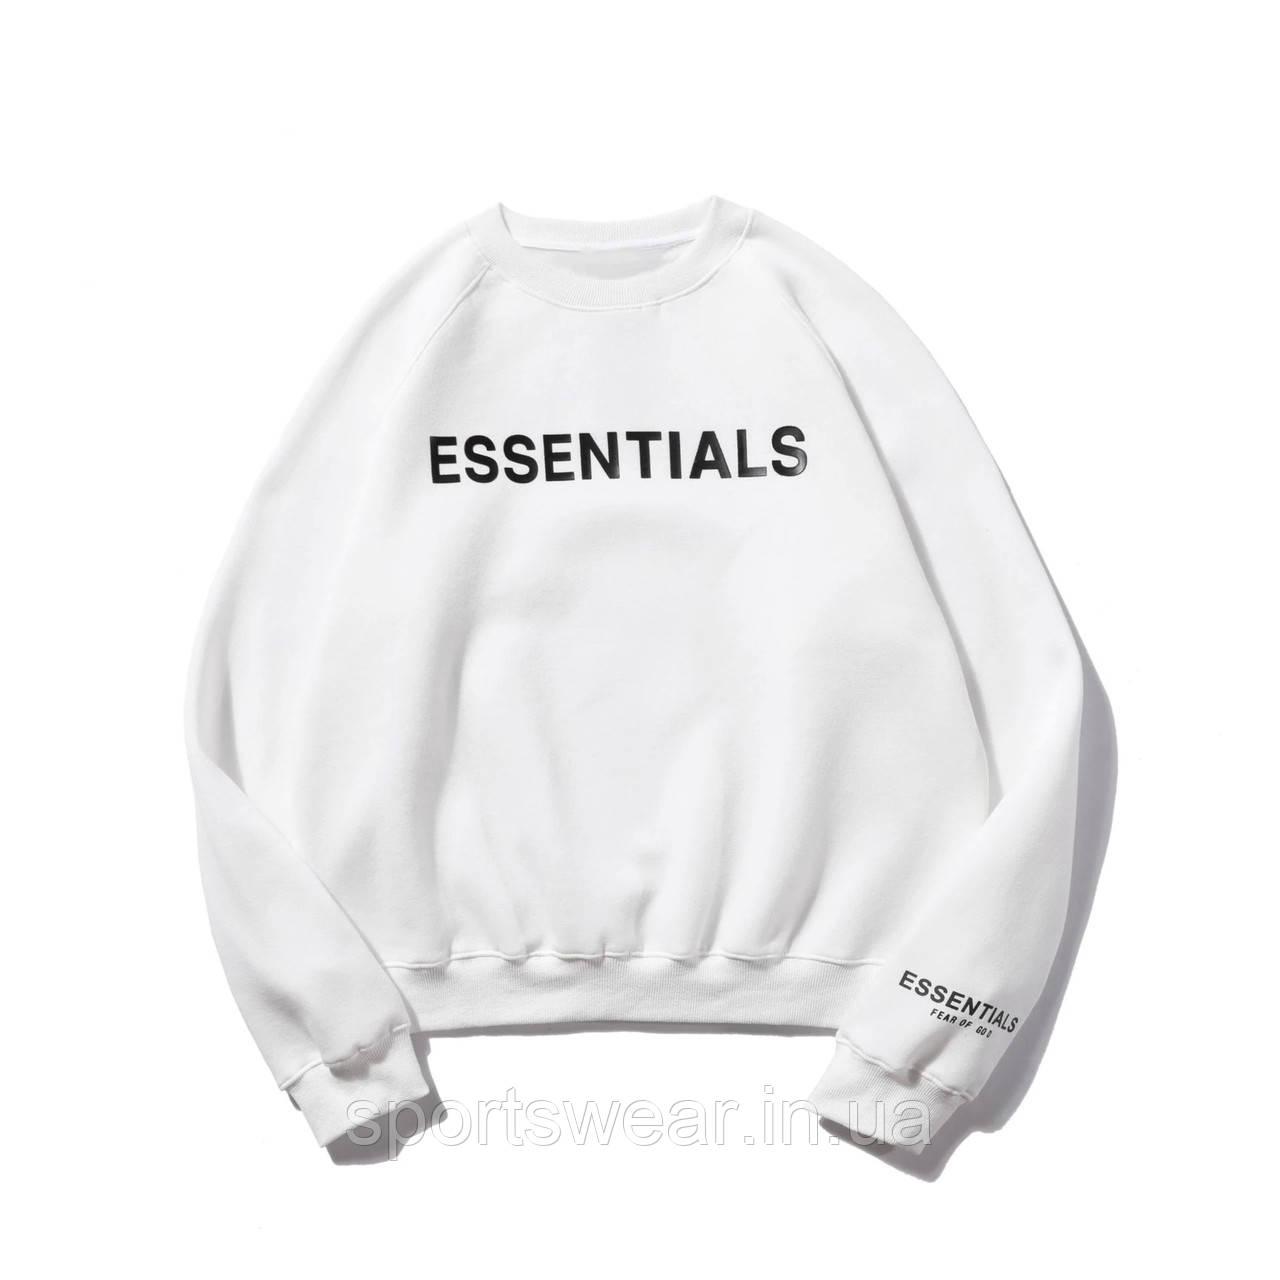 Белый свитшот Fear Of God Essentials Mod Logo, унисекс